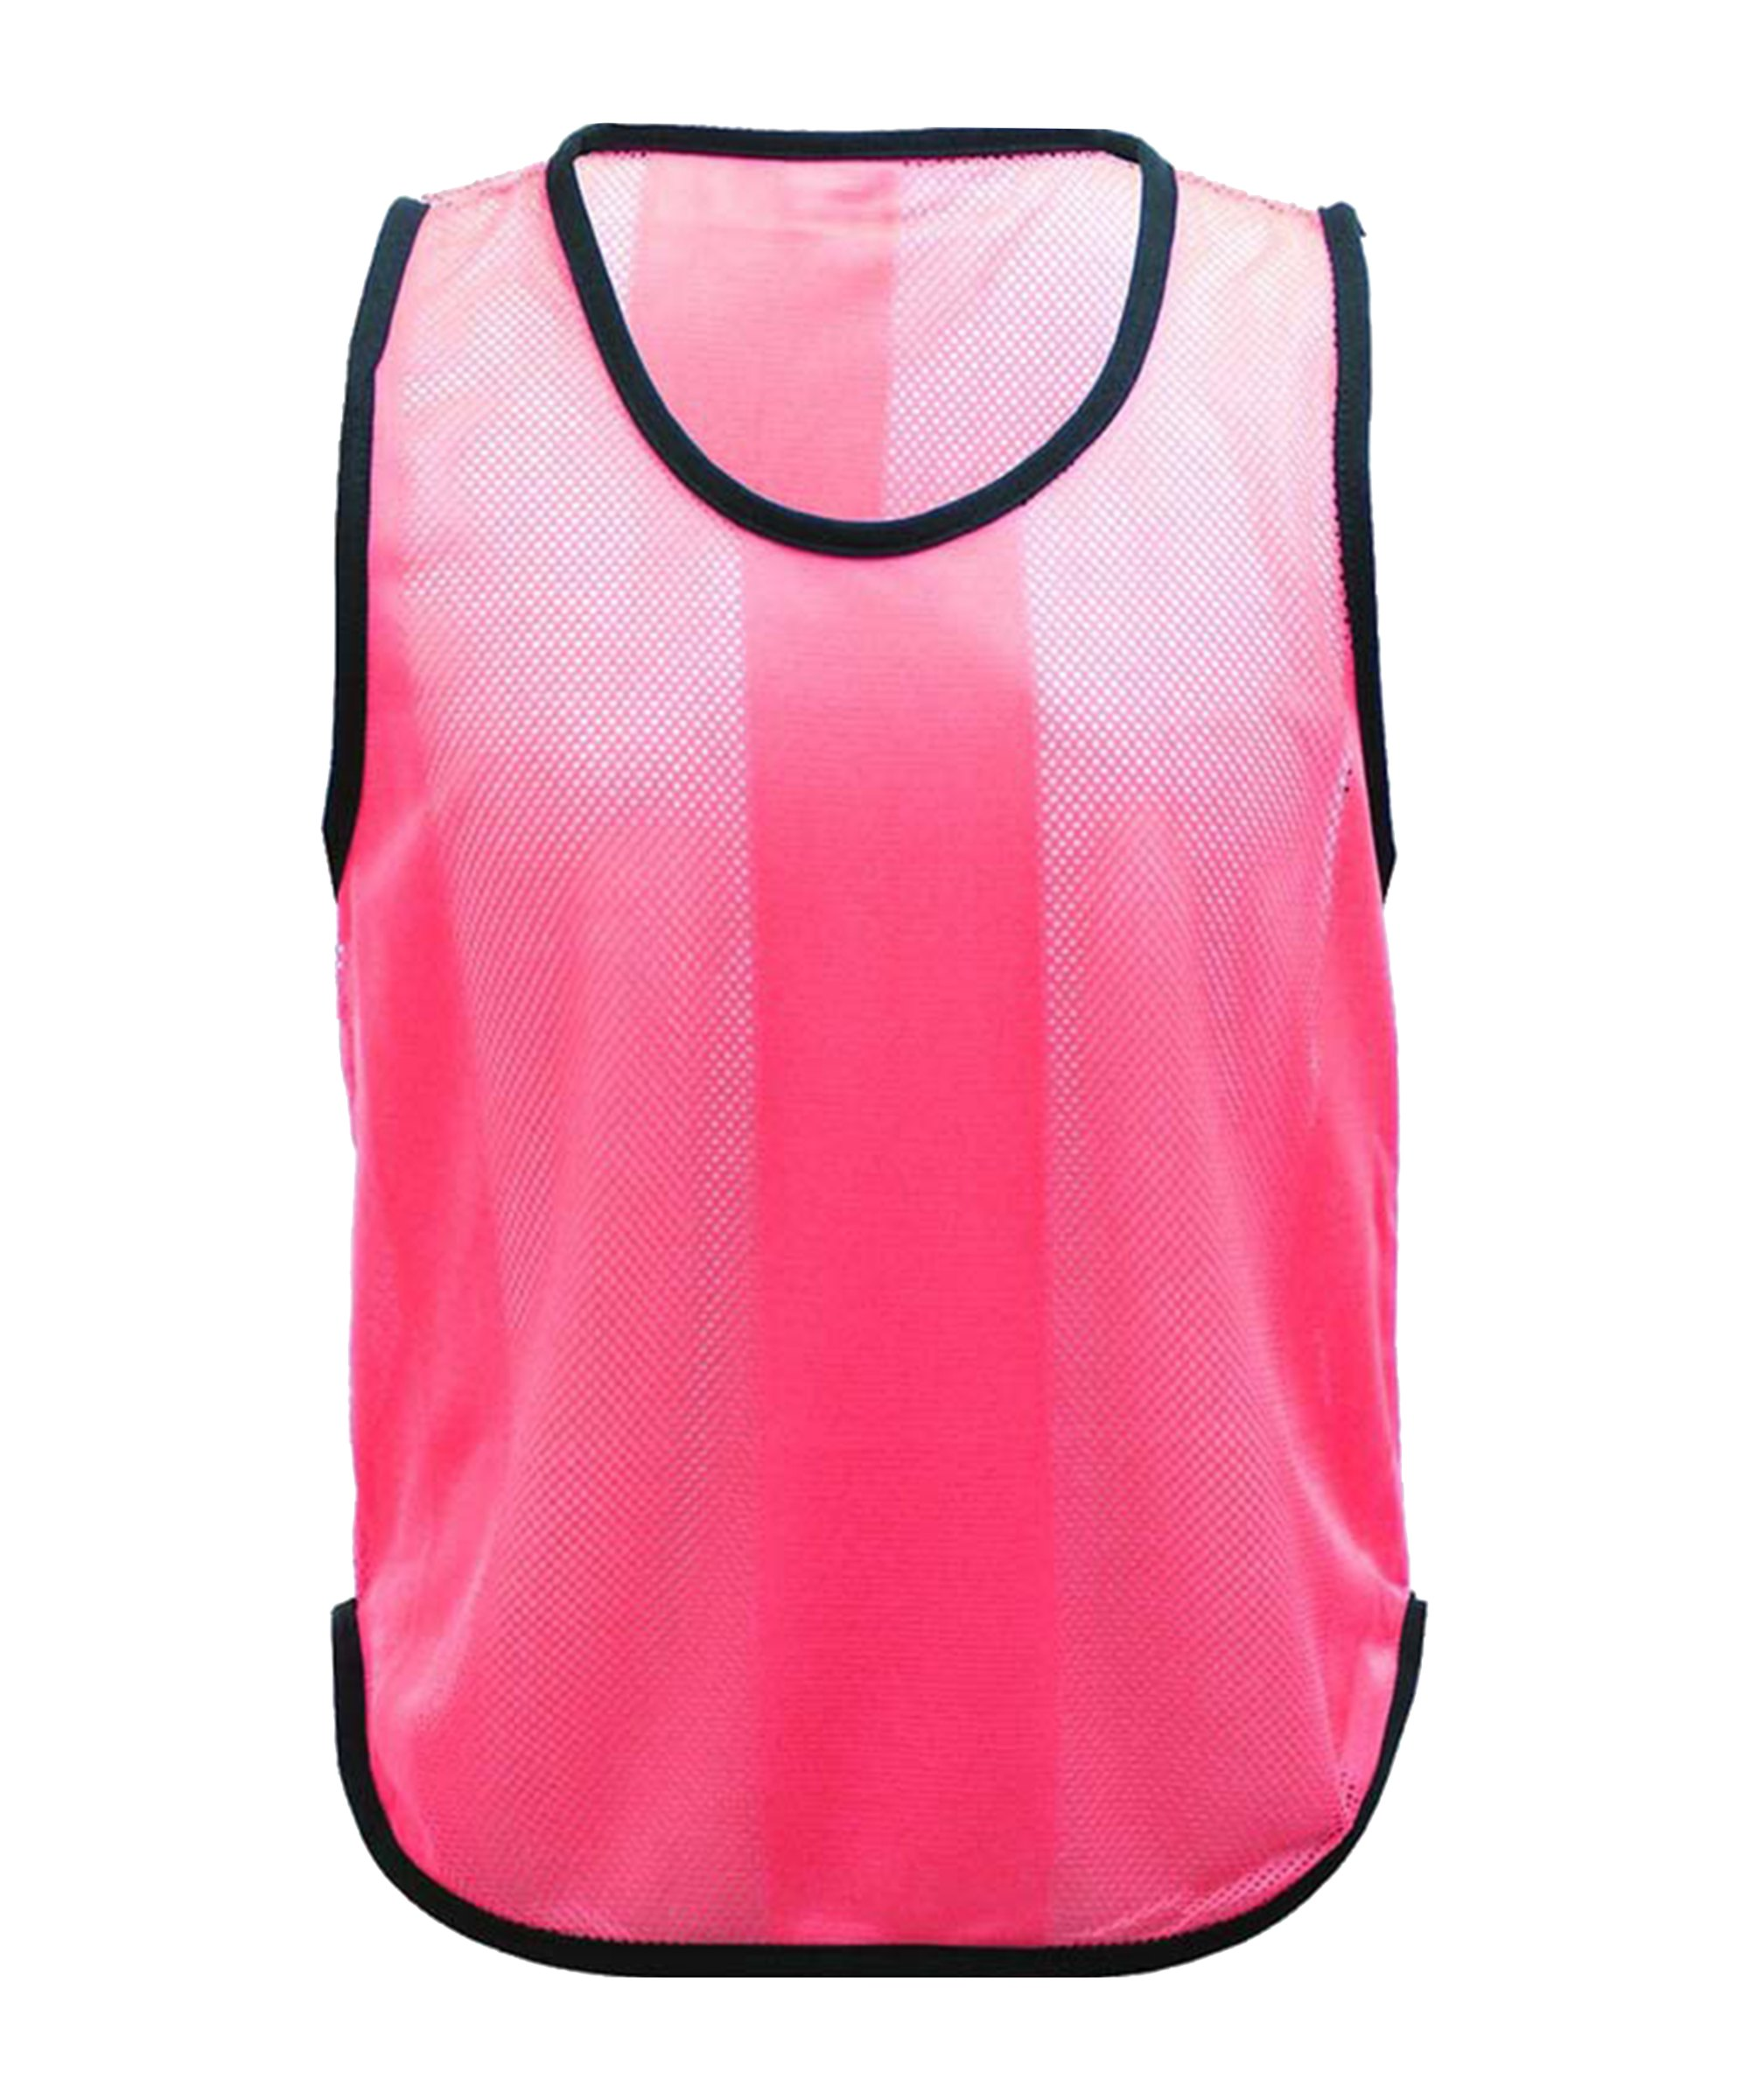 Cawila Trainingsleibchen UNI Junior Pink - pink